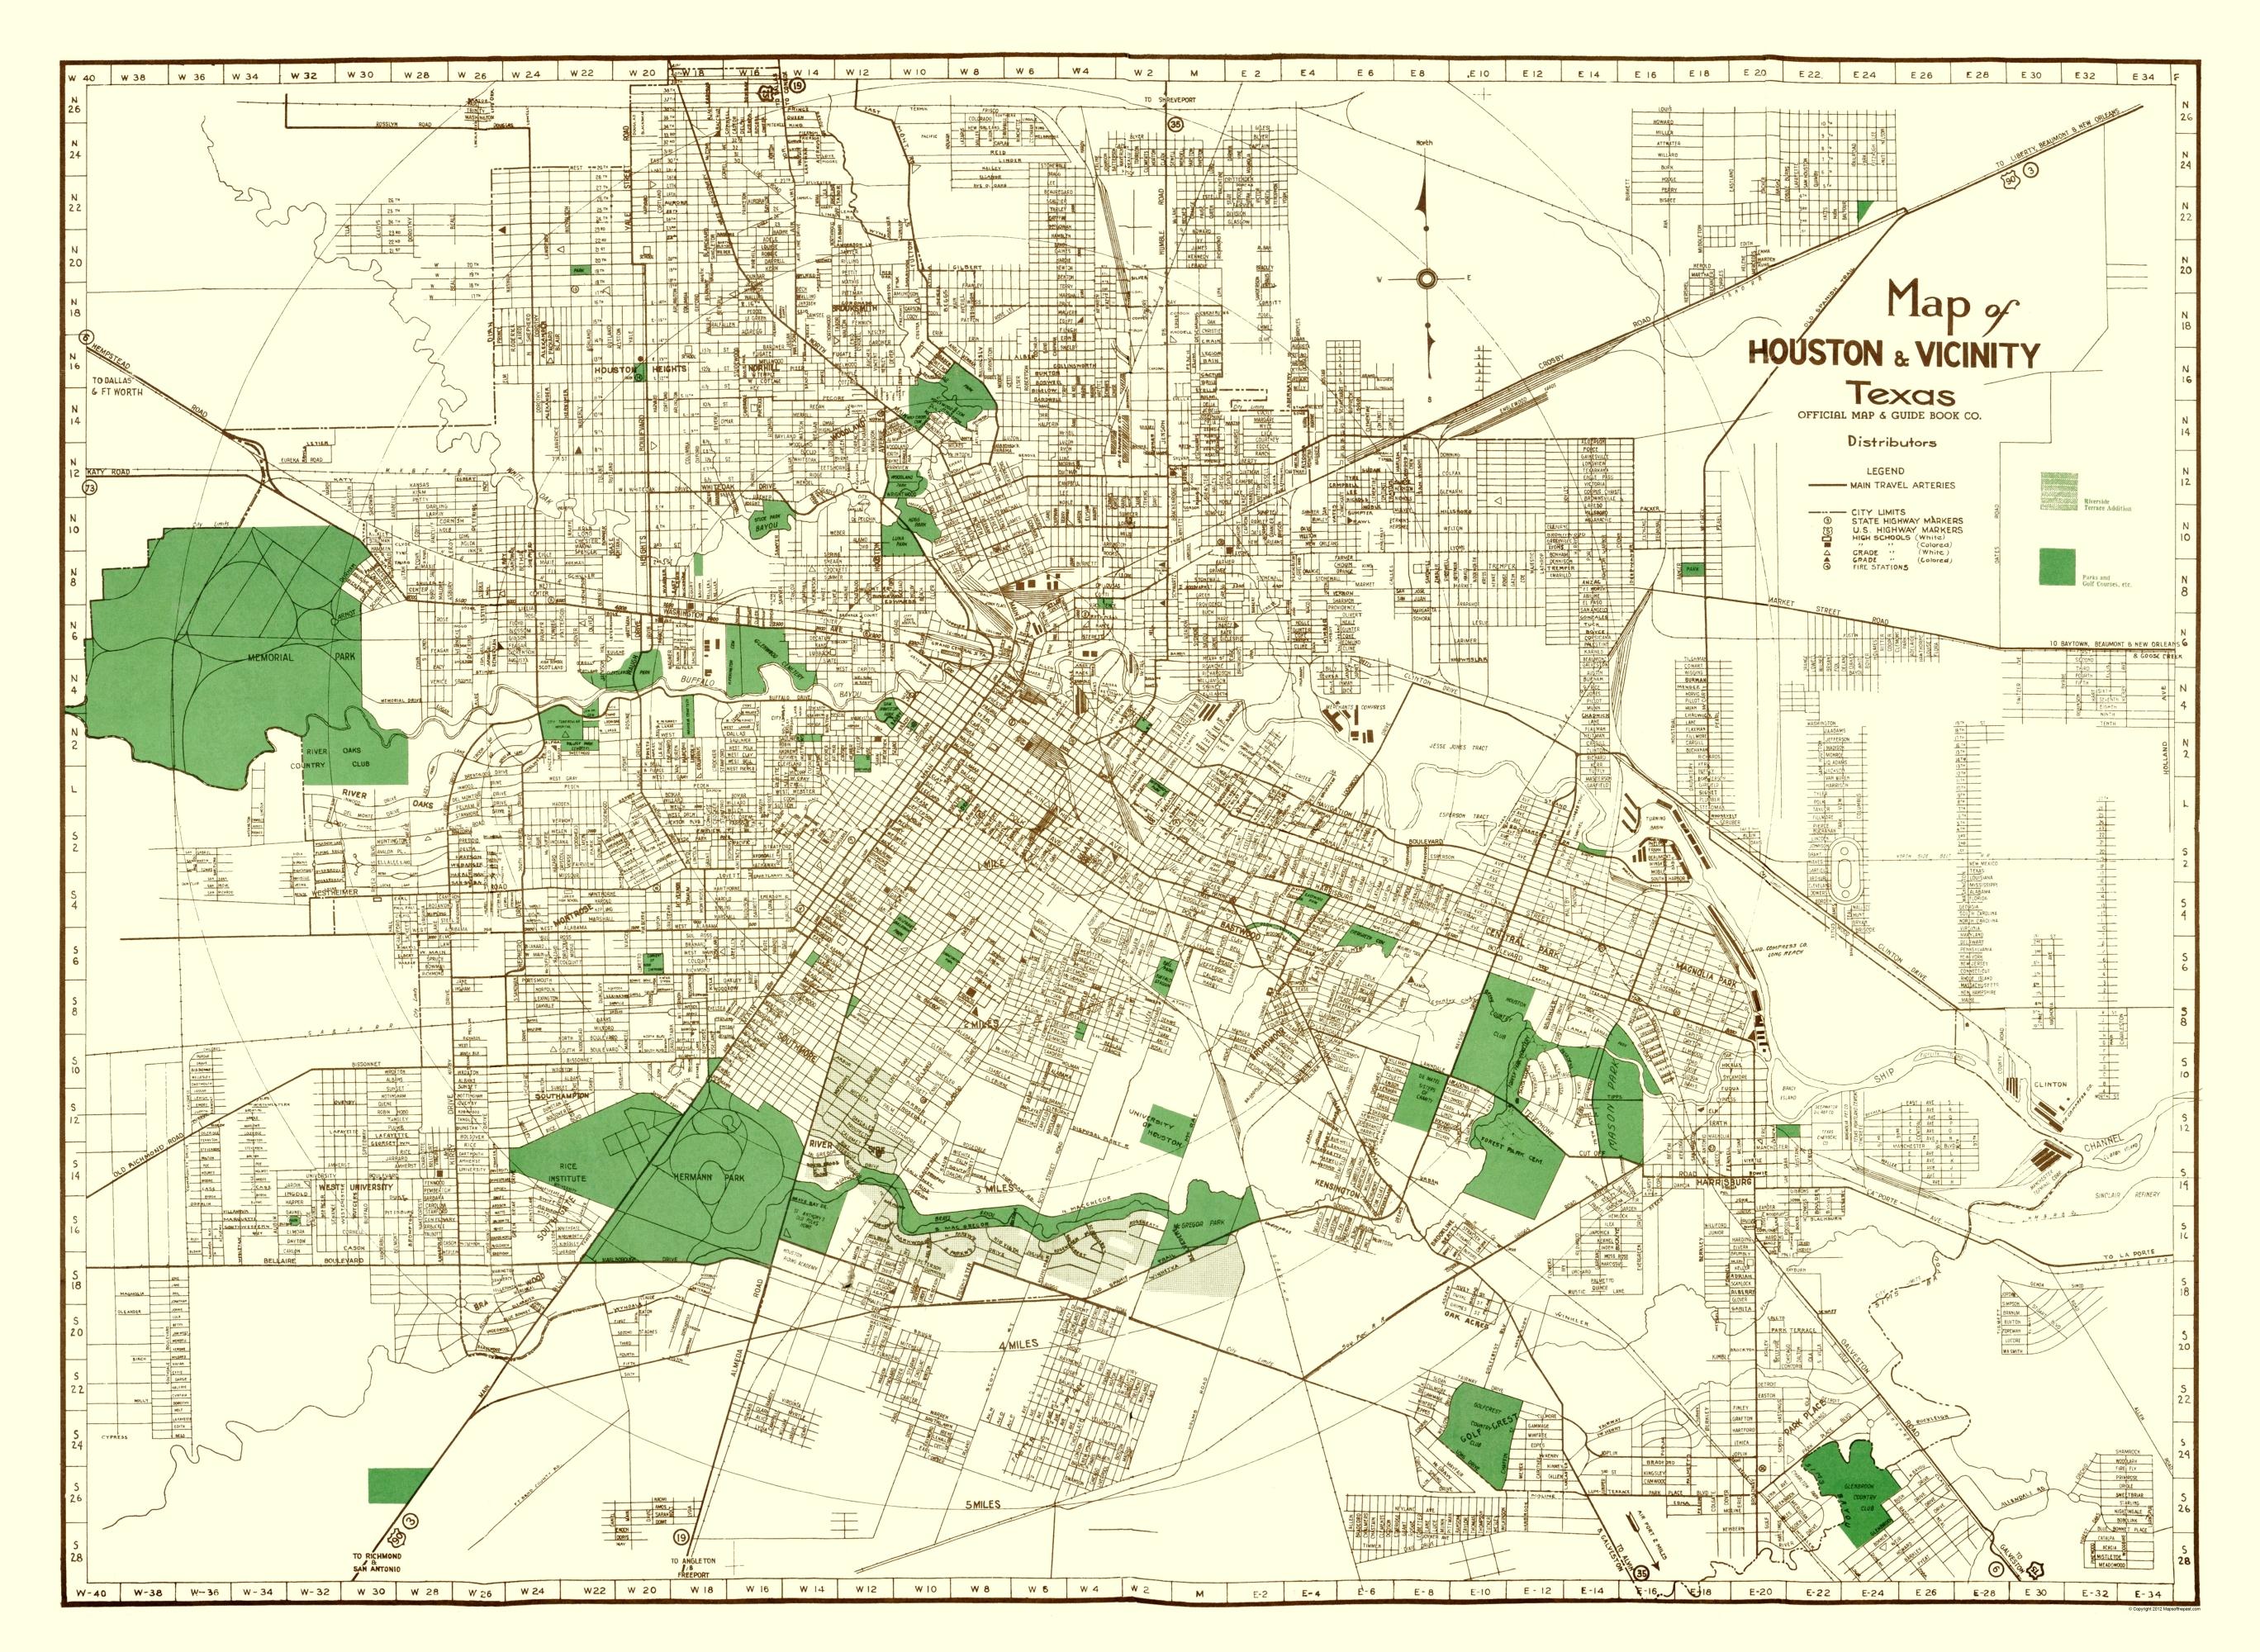 Old City Map - Houston Texas - Evans 1937 City Map Of Houston Texas on